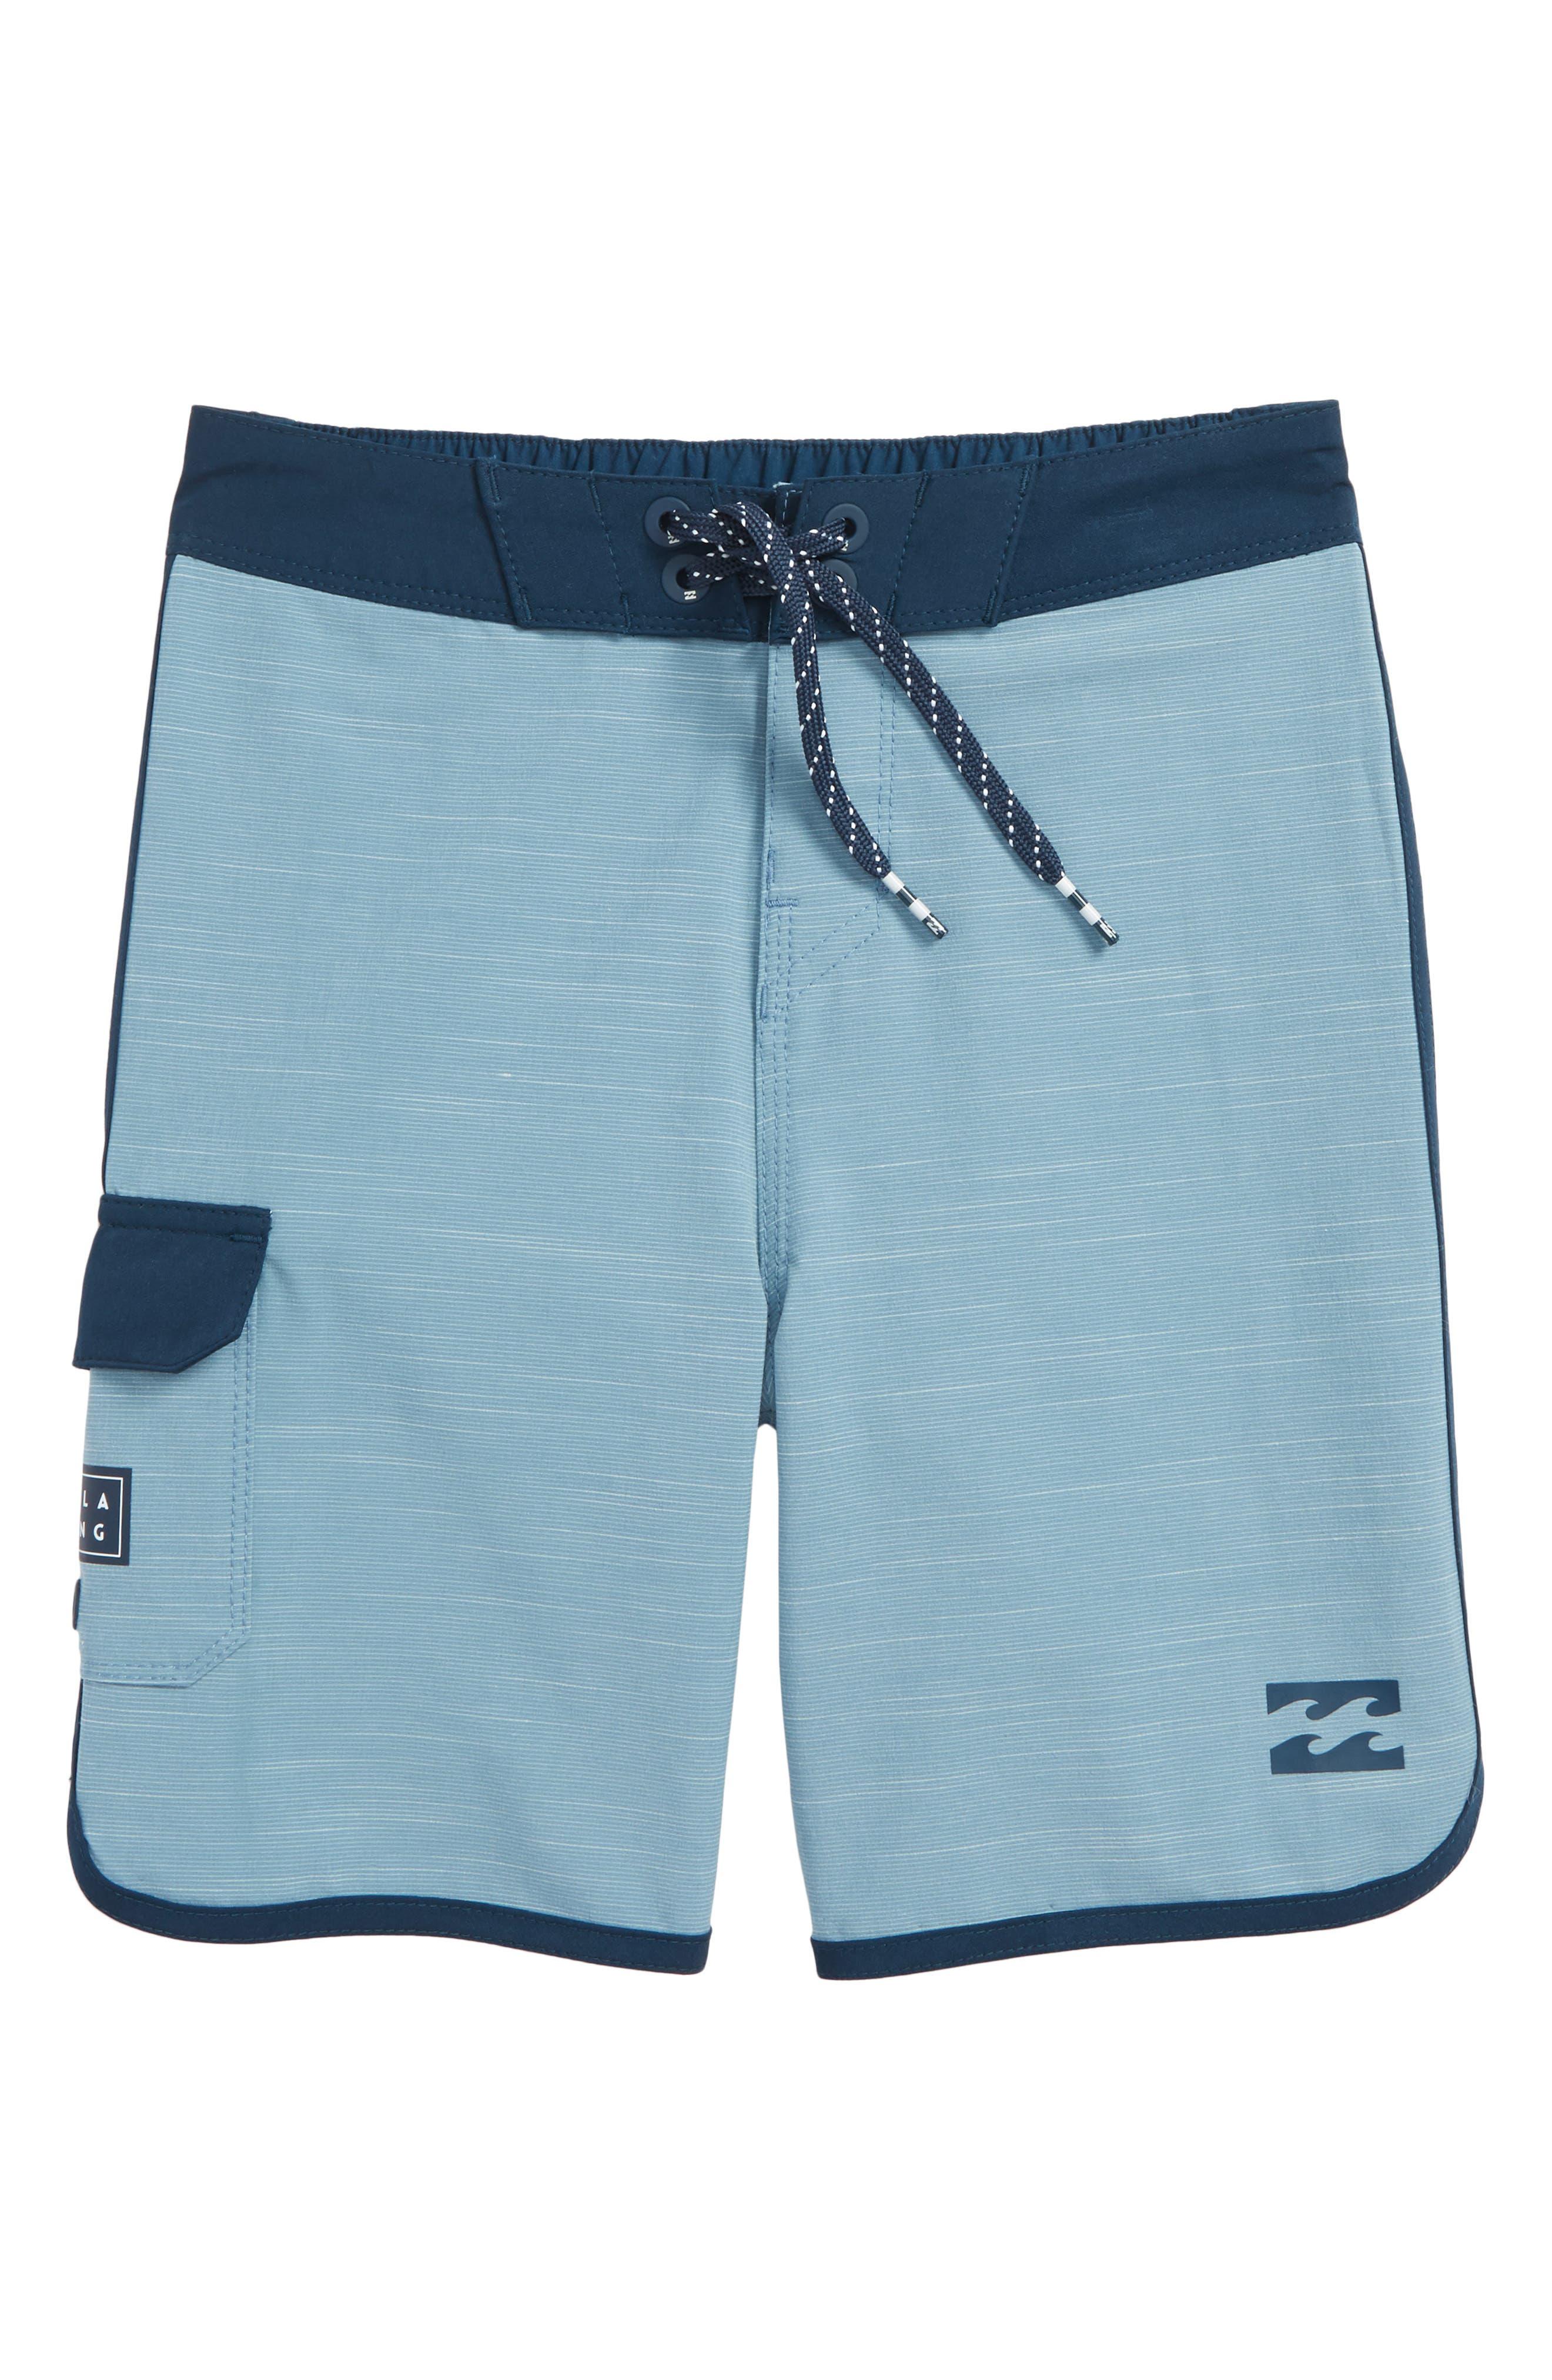 73 X Board Shorts,                         Main,                         color,